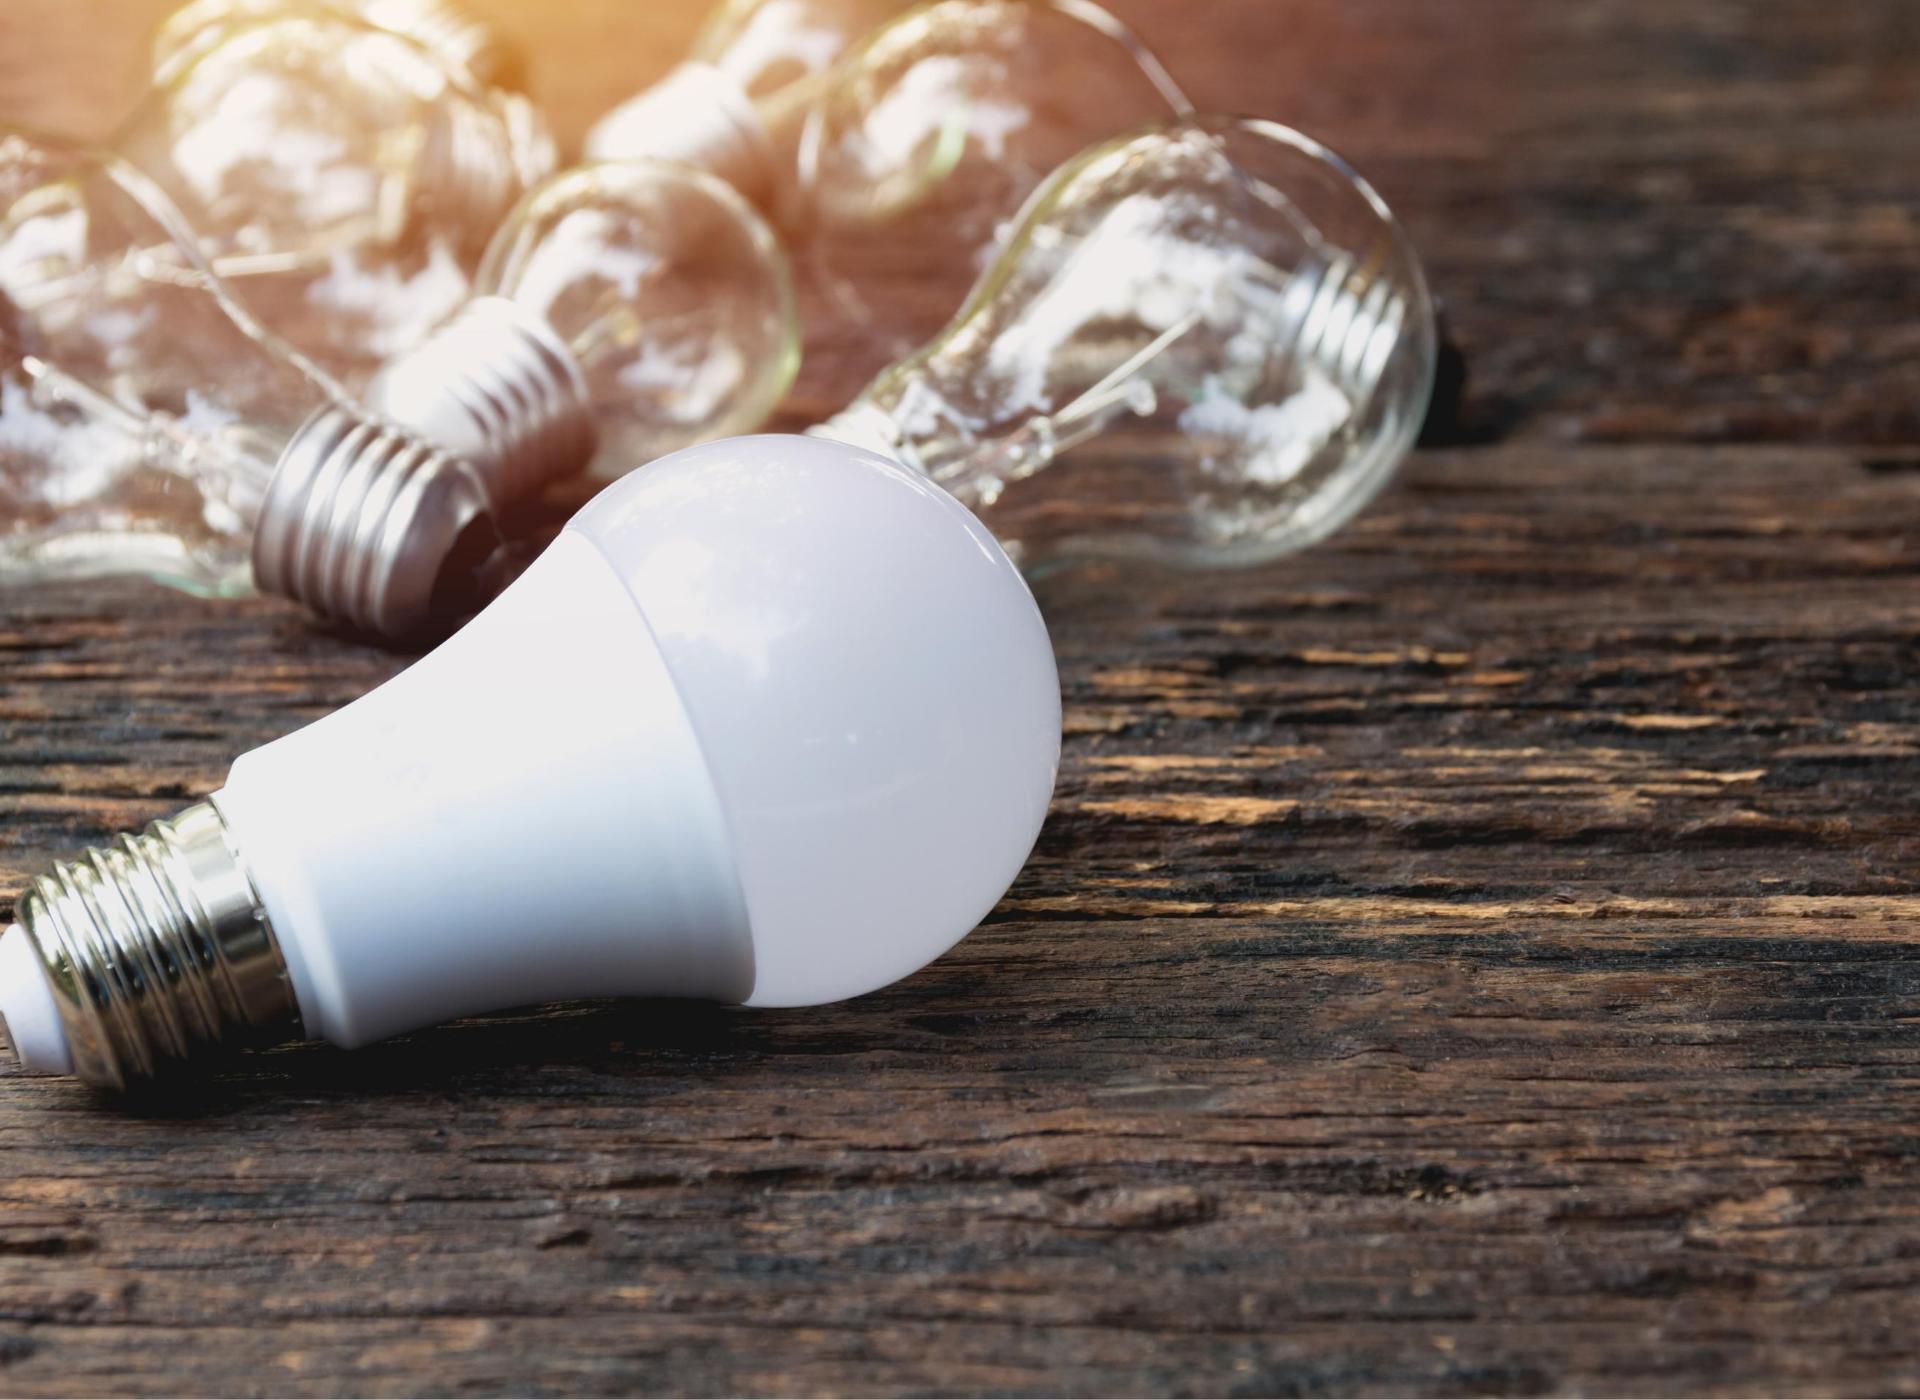 HAC energy services